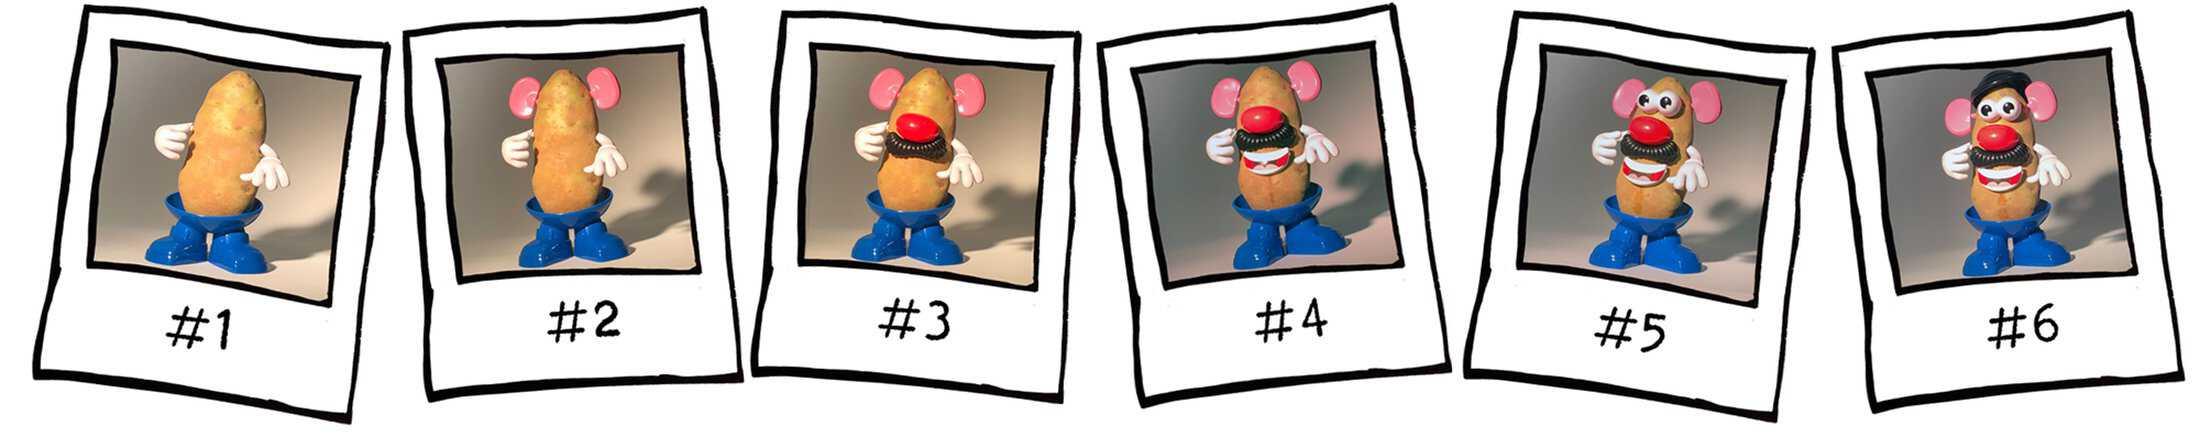 Mr-Potato-image-TY.jpg